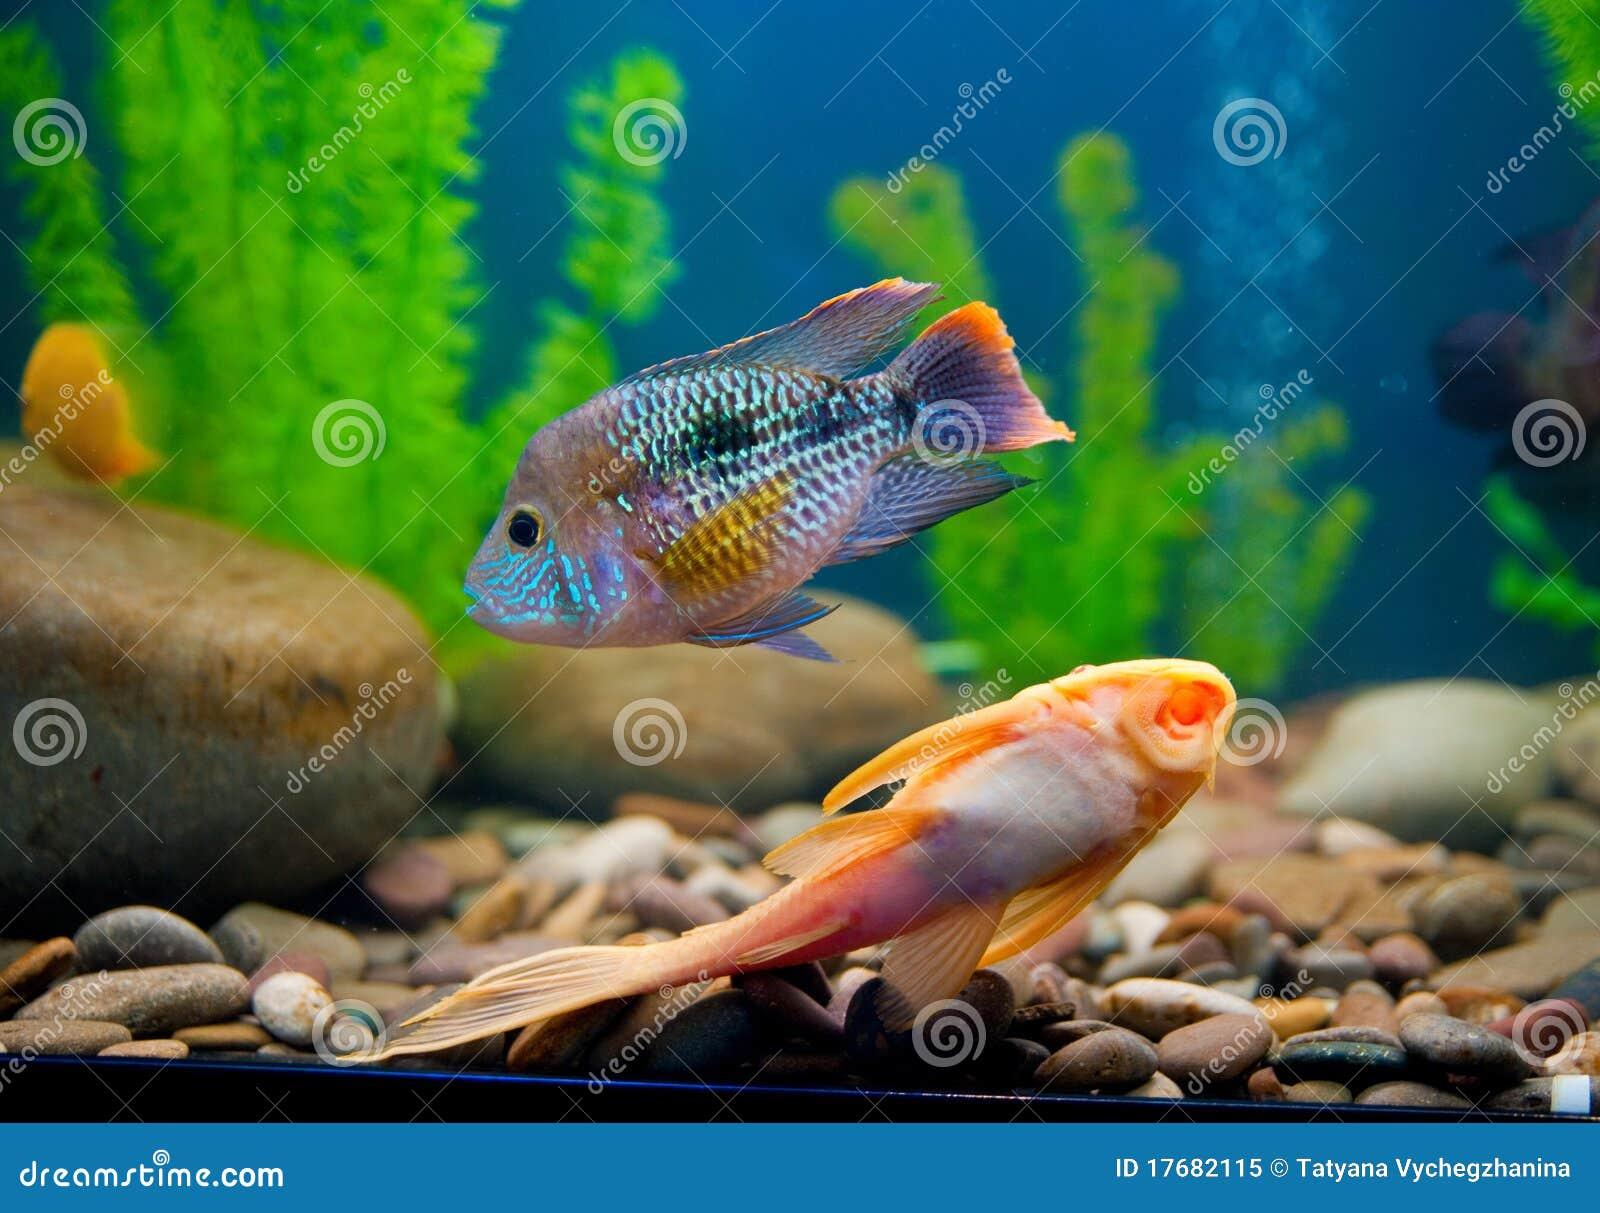 Colorful Fish Aquarium Royalty Free Stock Photo Image